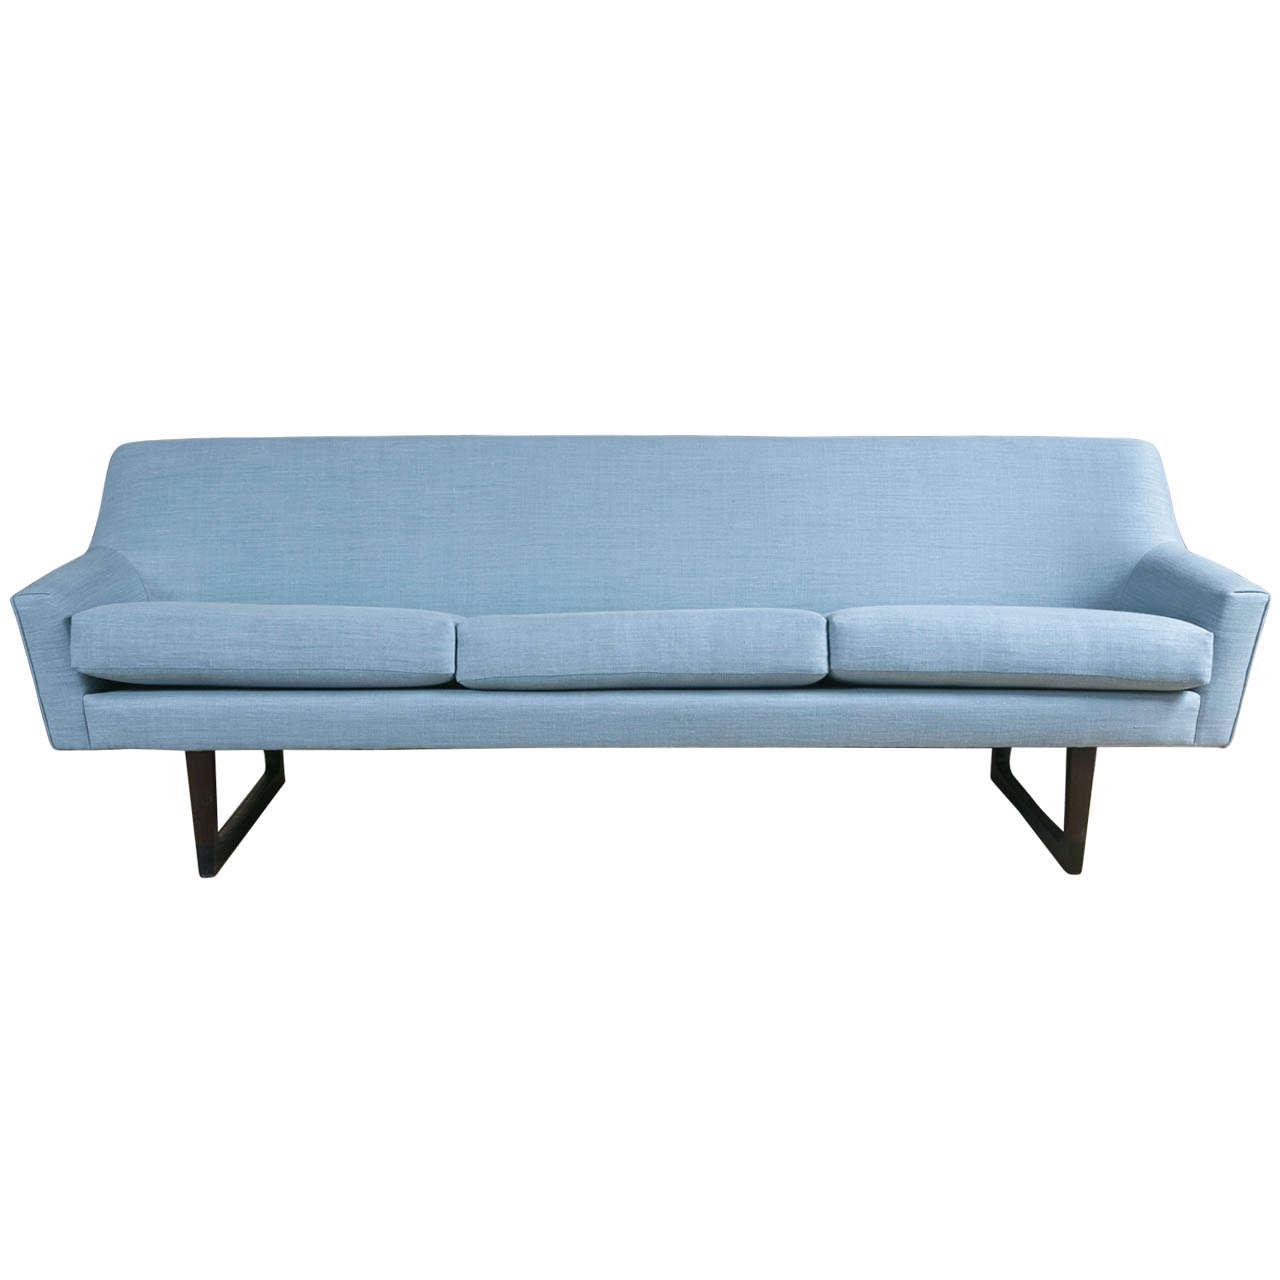 Mid century danish modern sofa at 1stdibs for Danish modern sofas